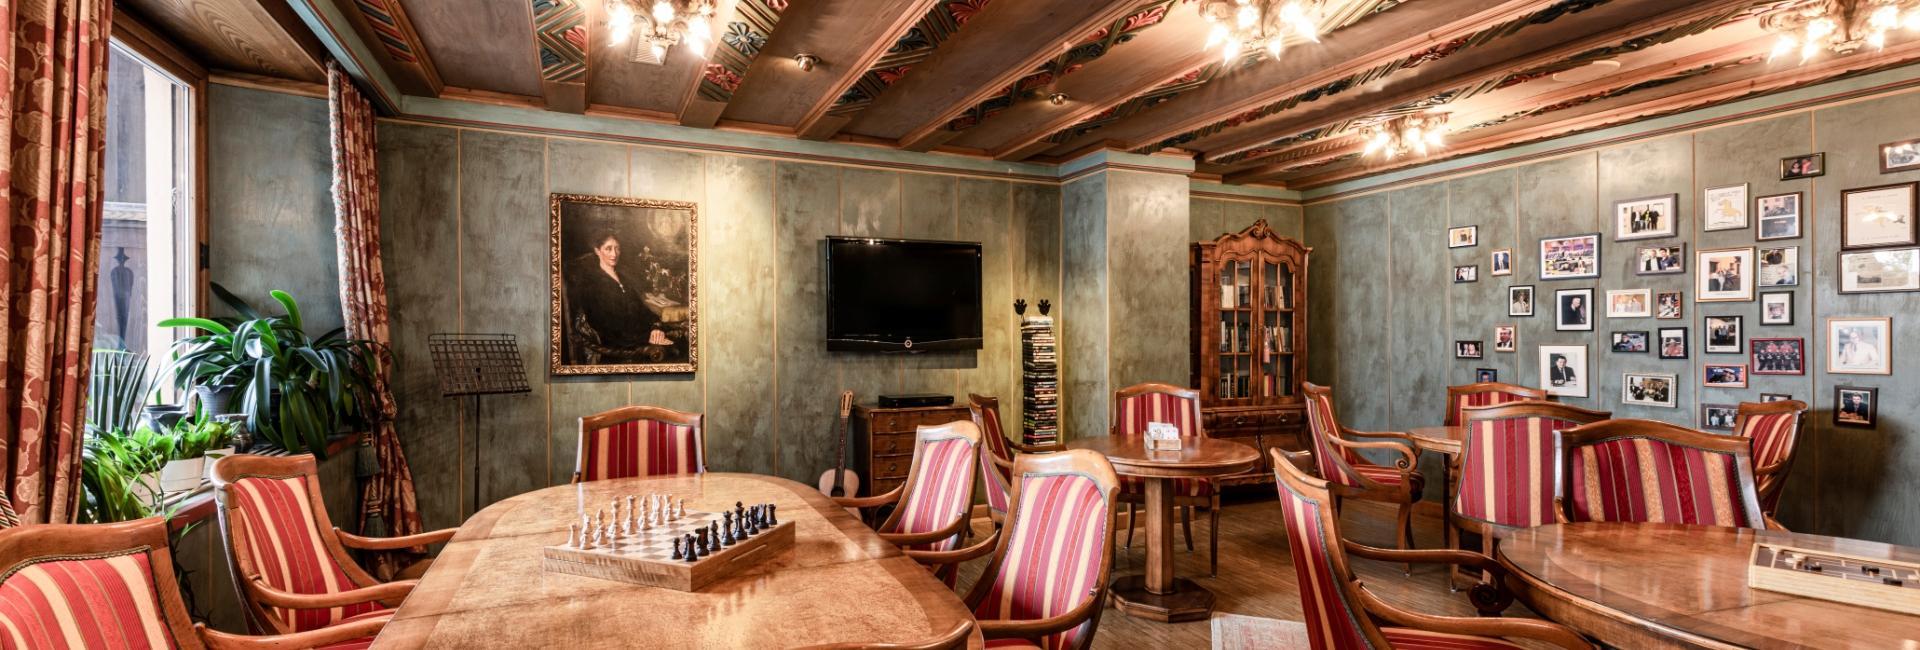 Hotel Cavallino d'Oro, Dolomites